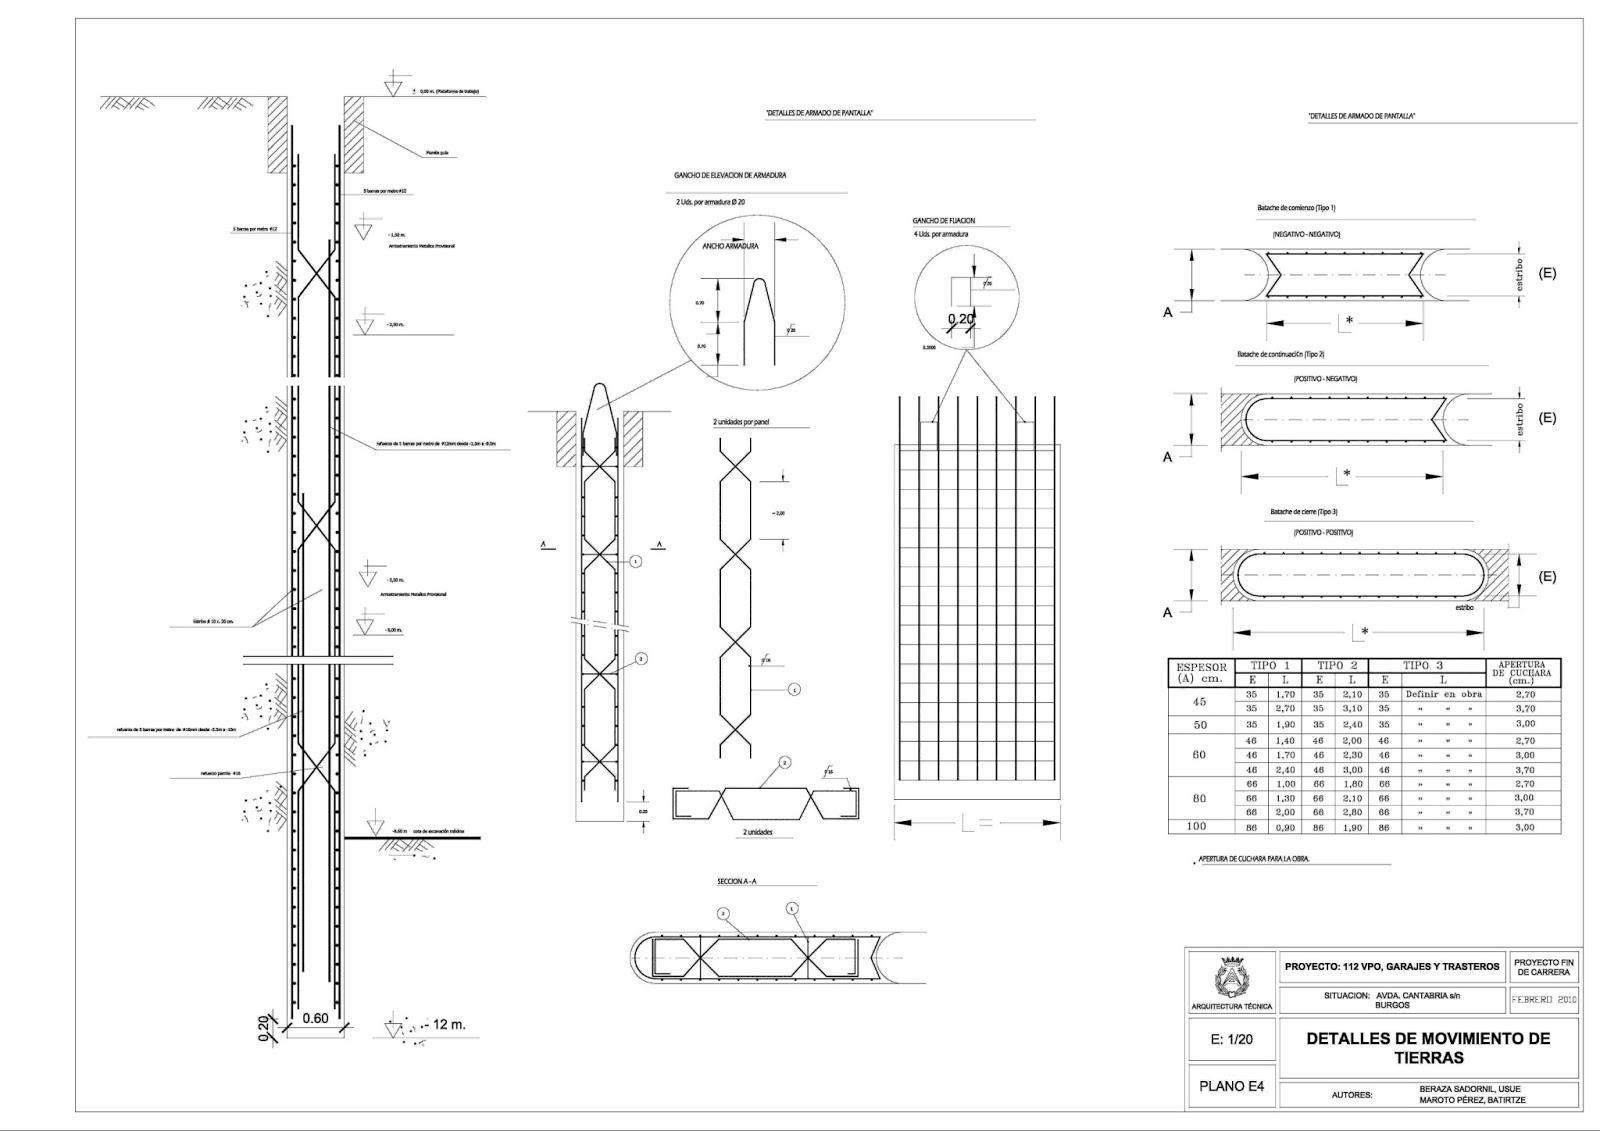 Usue beraza pfc arquitectura t cnica for Arquitectura tecnica a distancia